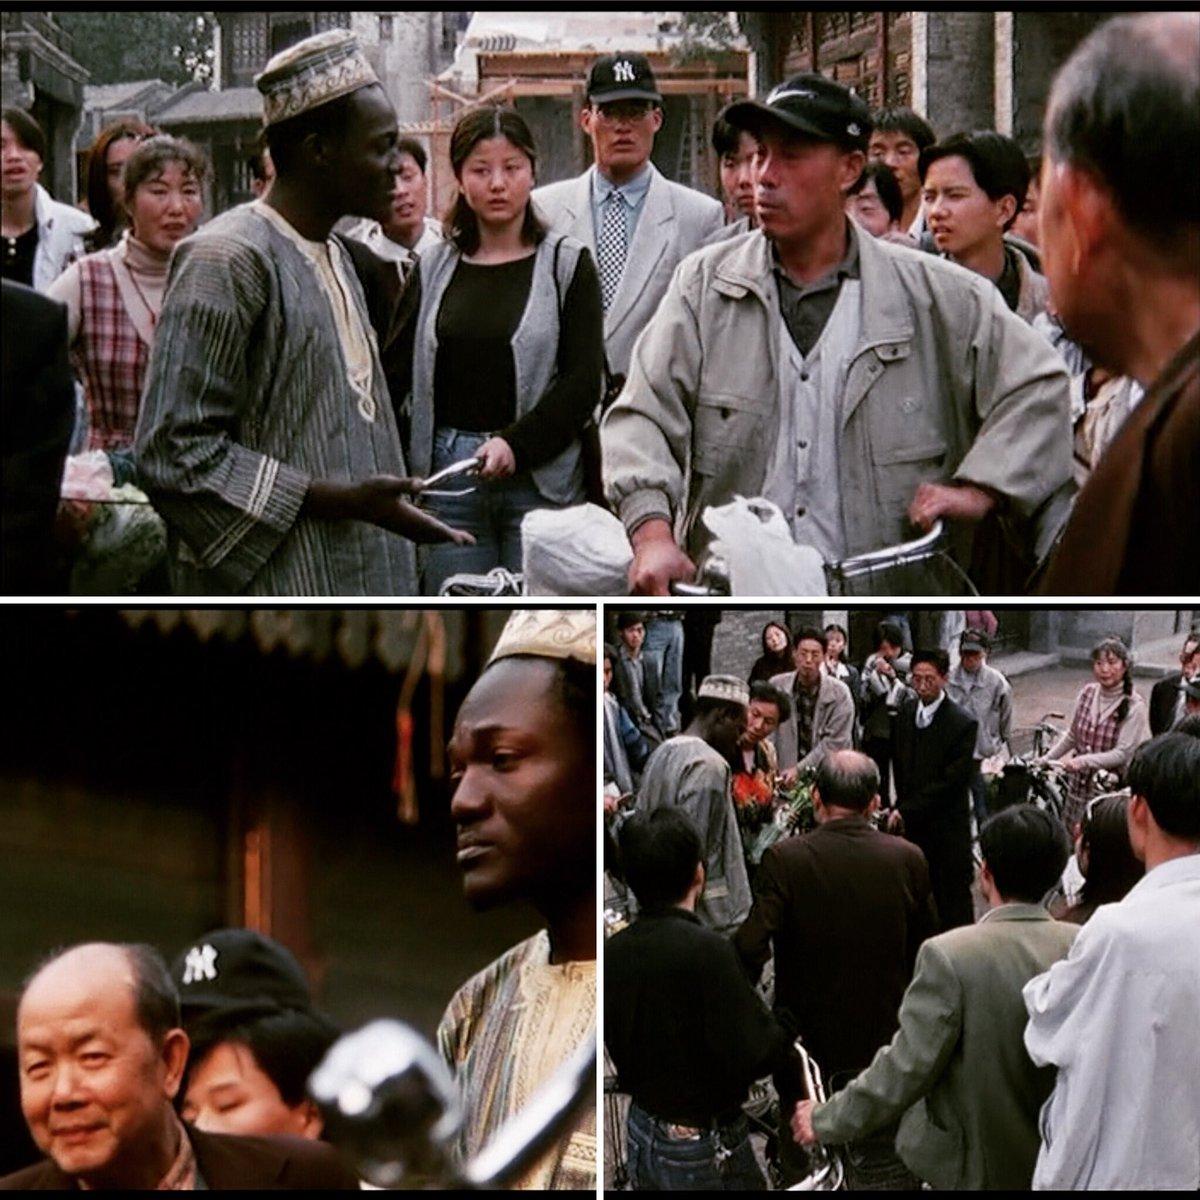 «BLACK LOVE IN YELLOW HEART» #1 #1jour1photo #Filmmaker #China #Africa #movie #comedy #acting @josephkumbela #actorlife #actresslife #congolese #setlife #lesfilmsdelabasproduction  https://www.lesfilmsdelabas.com  Instagram @lesfilmsdelabaspic.twitter.com/InVhDMjBHM